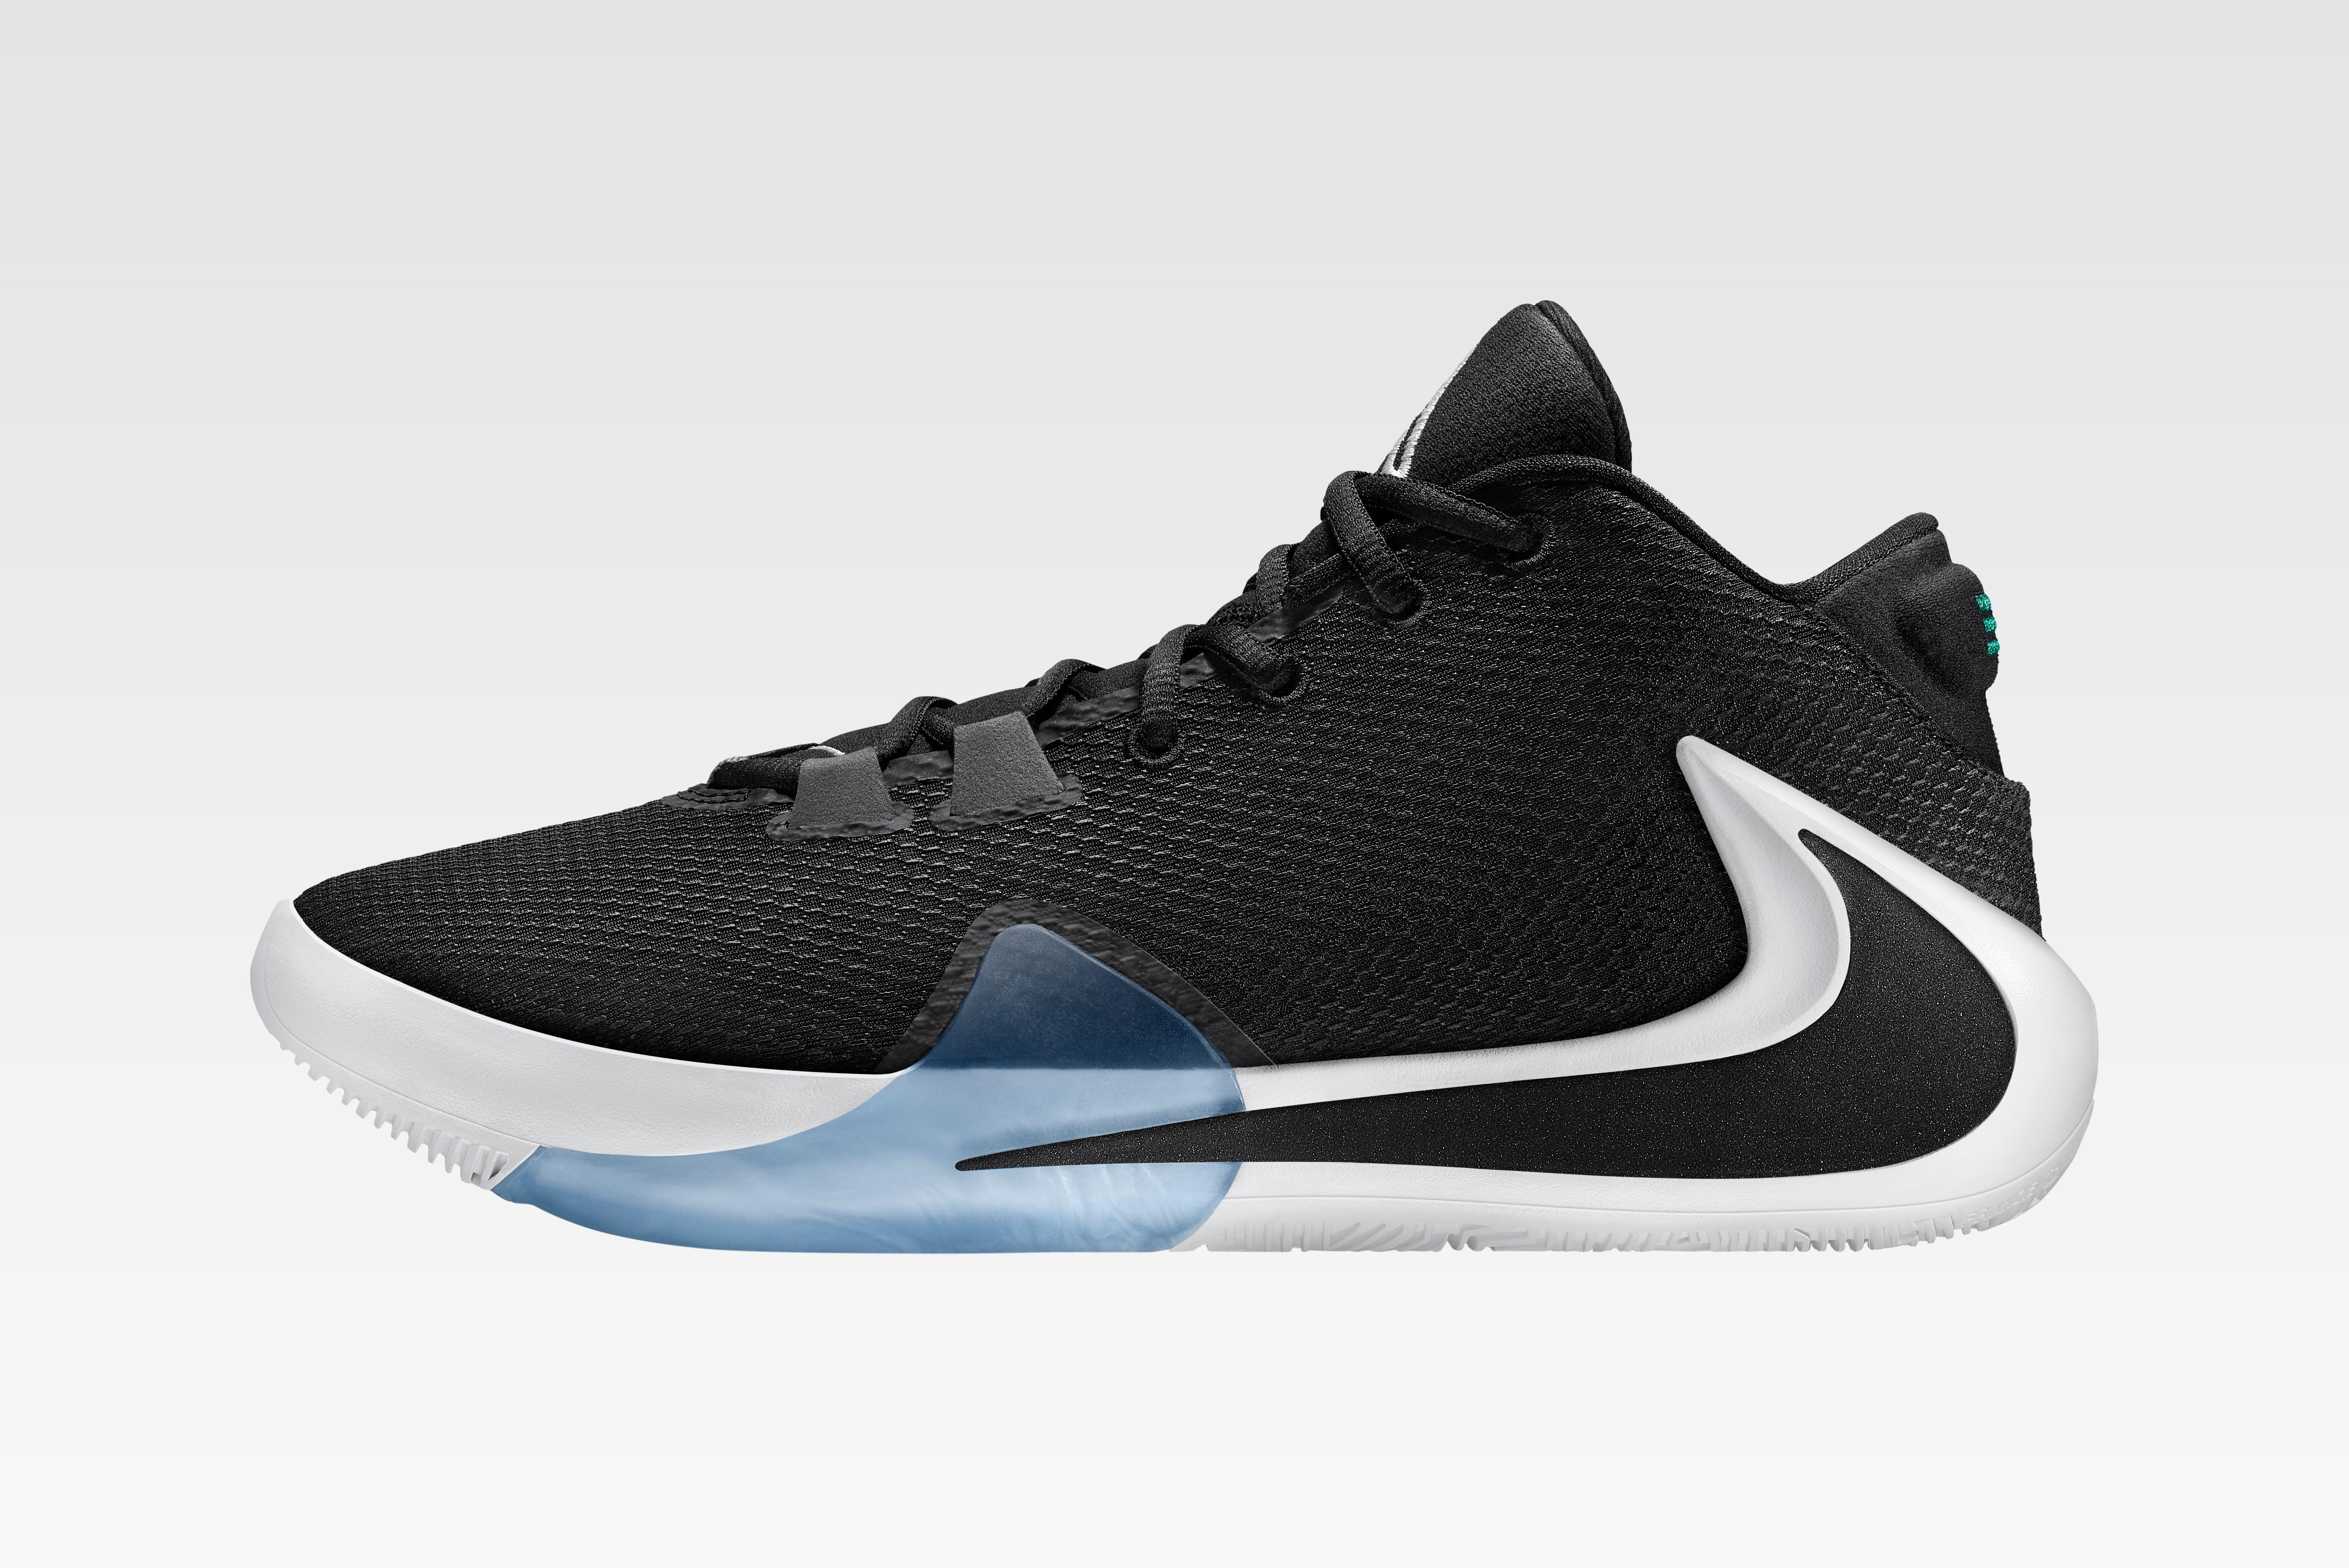 Nike Air Zoom Freak 1 (Black Lateral)